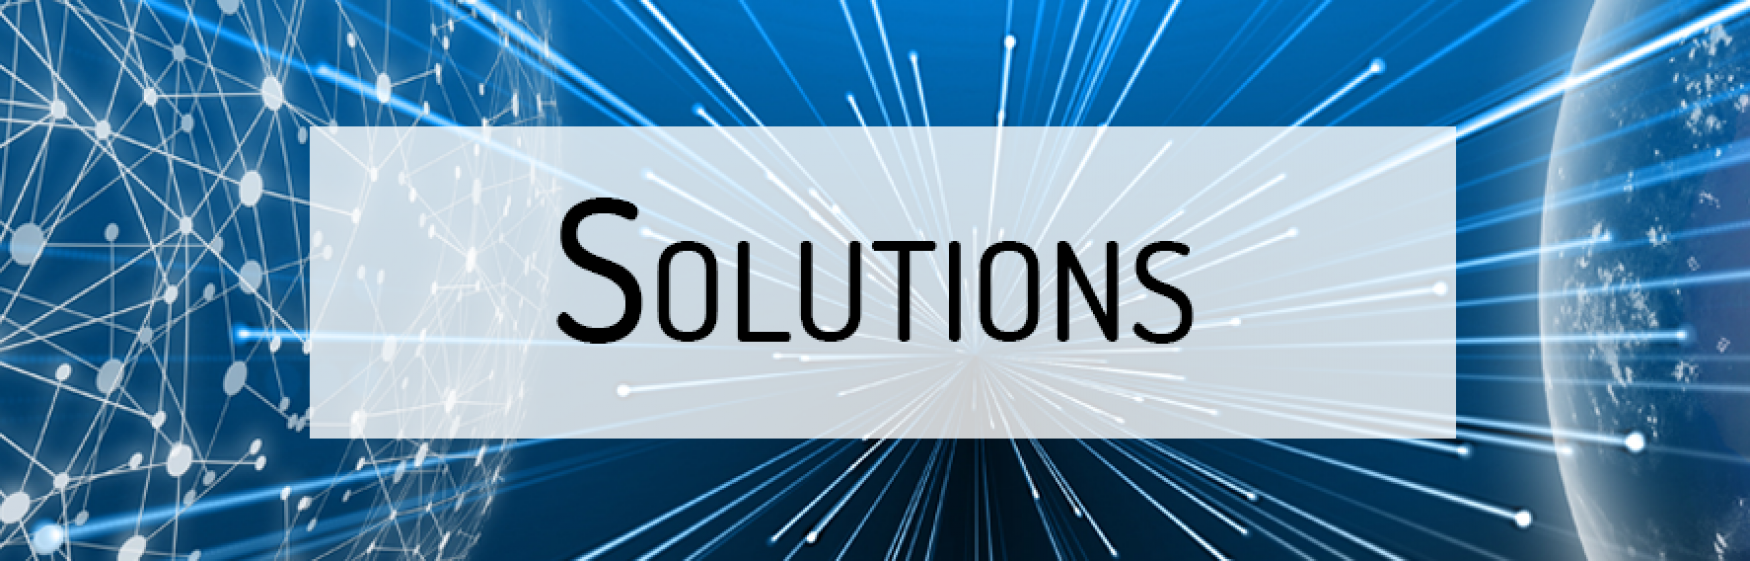 BANNIERE SOLUTIONS M